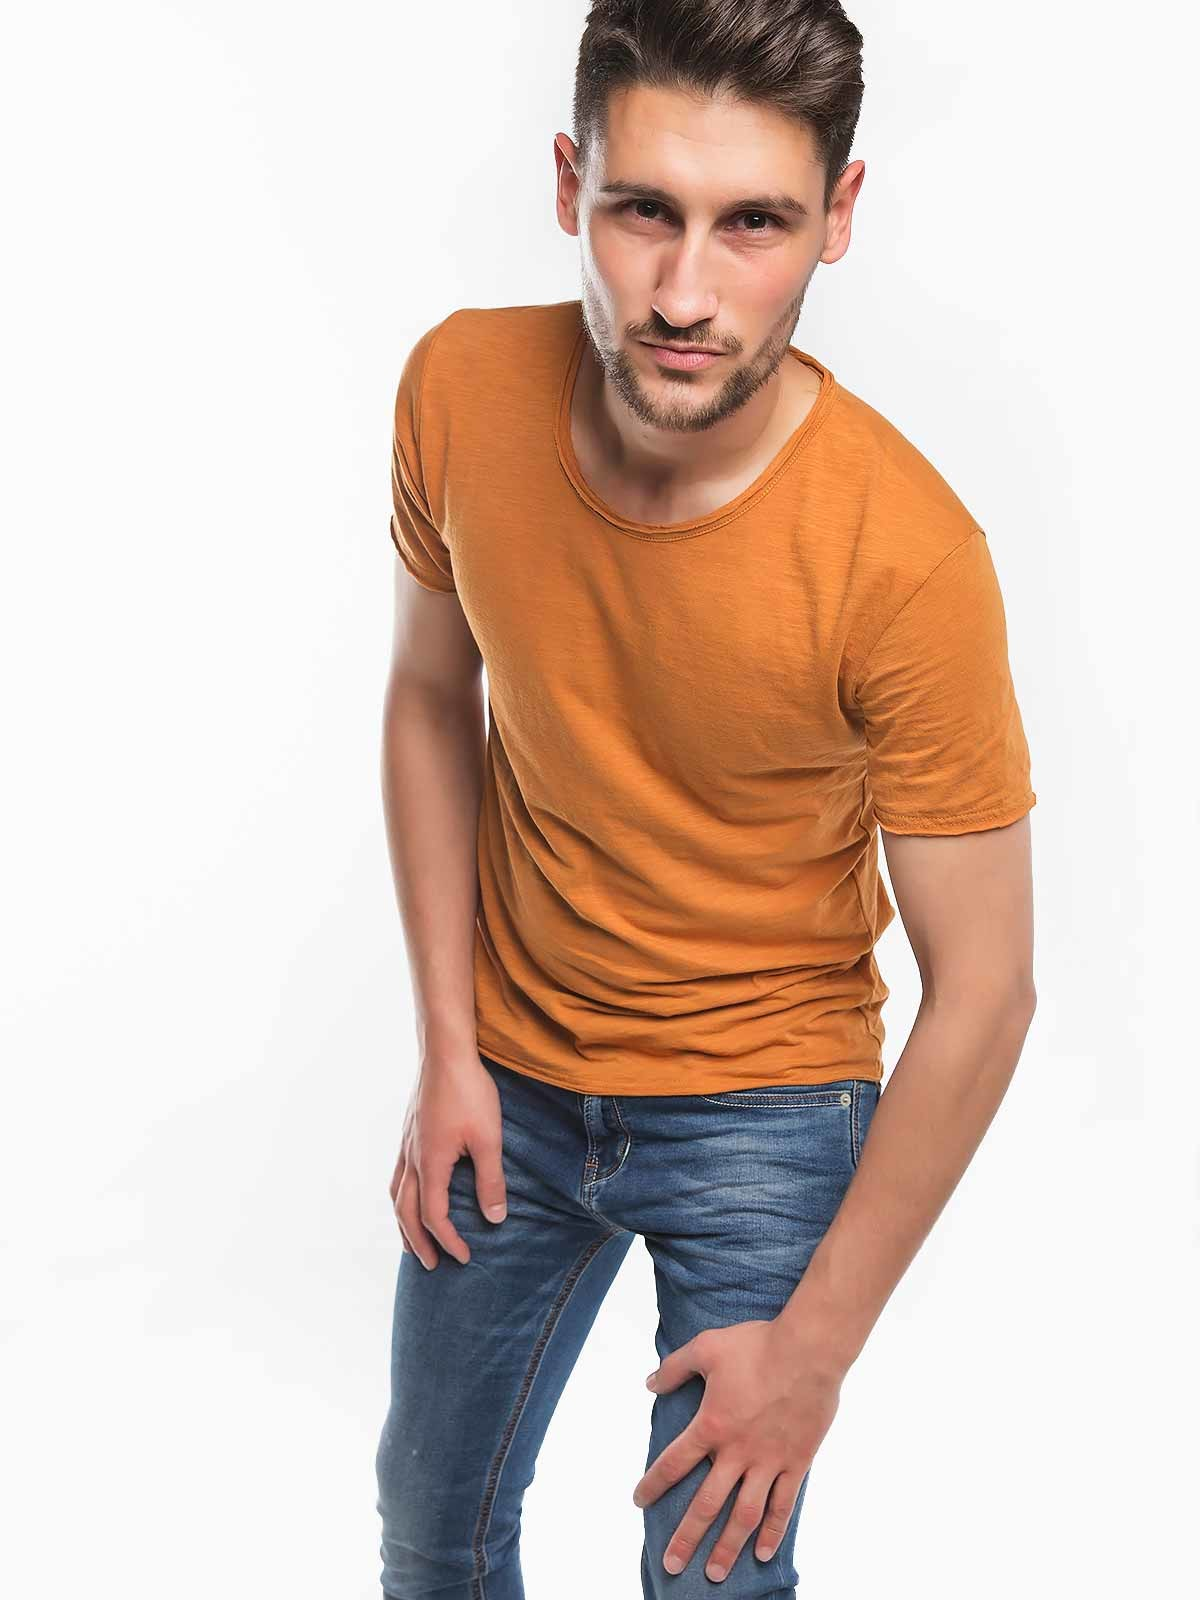 Camiseta de algodón para hombre